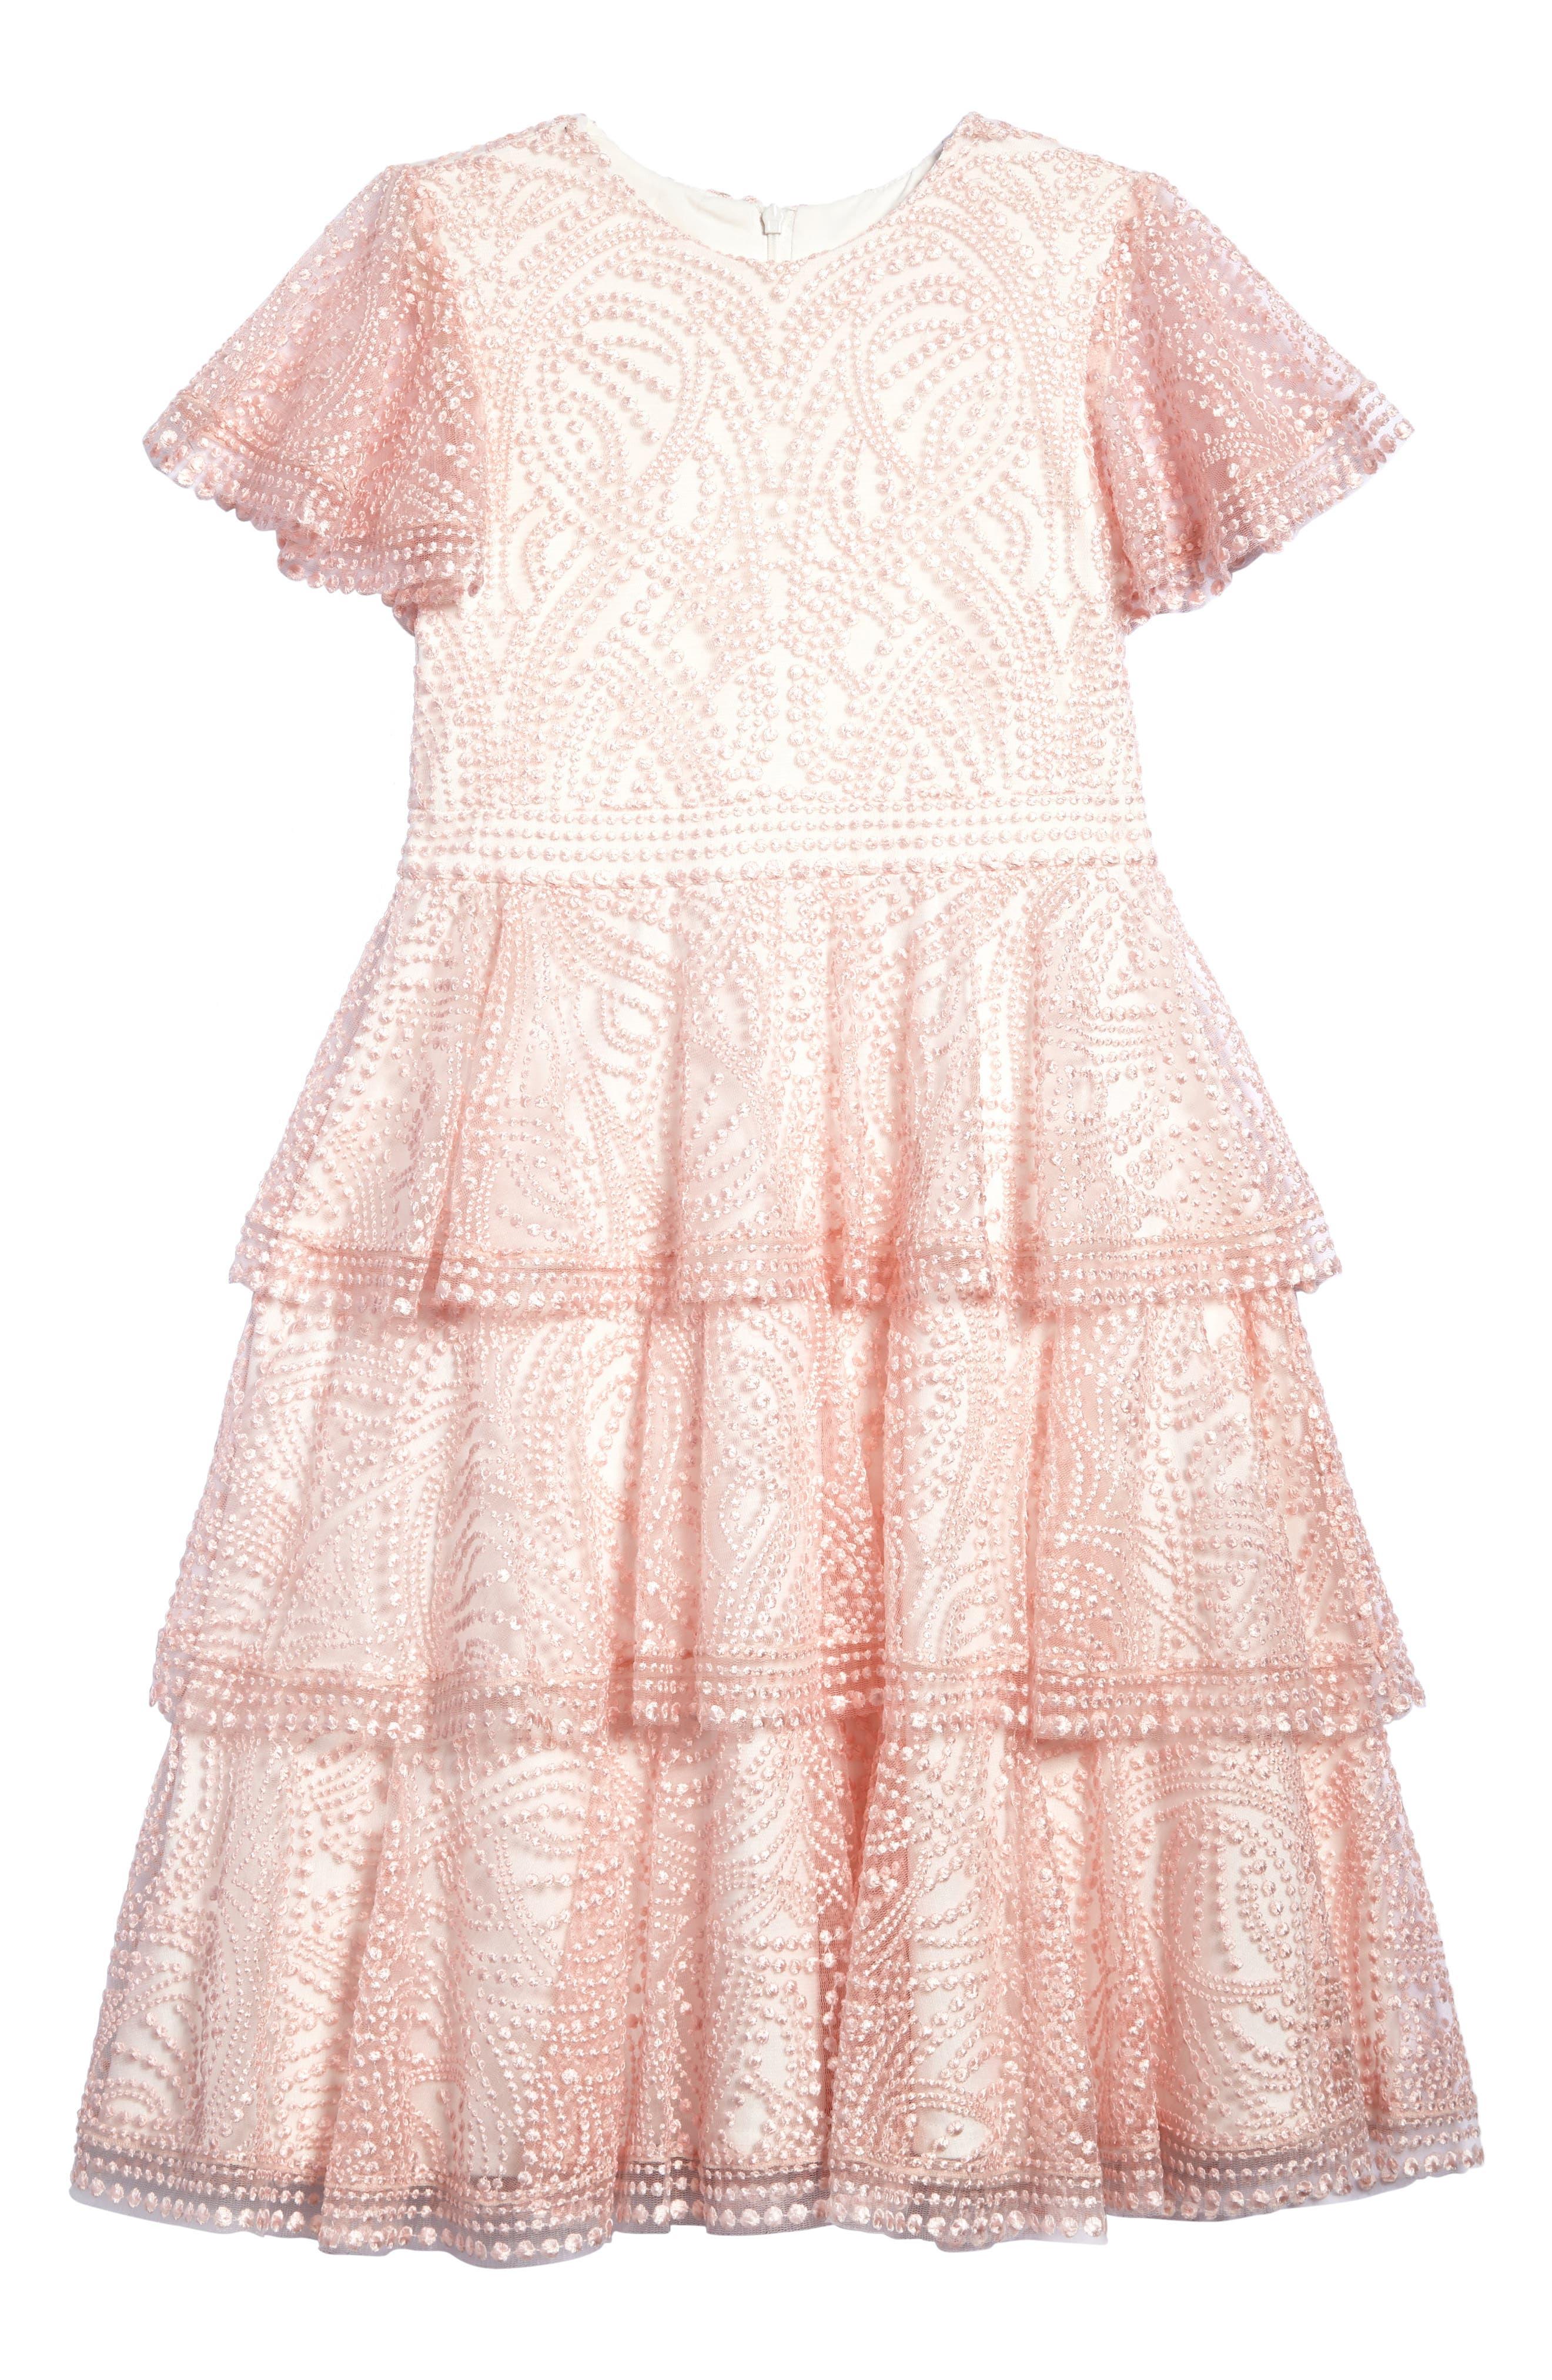 Main Image - Tadashi Shoji Embroidered Ruffle Dress (Toddler Girls, Little Girls & Big Girls)